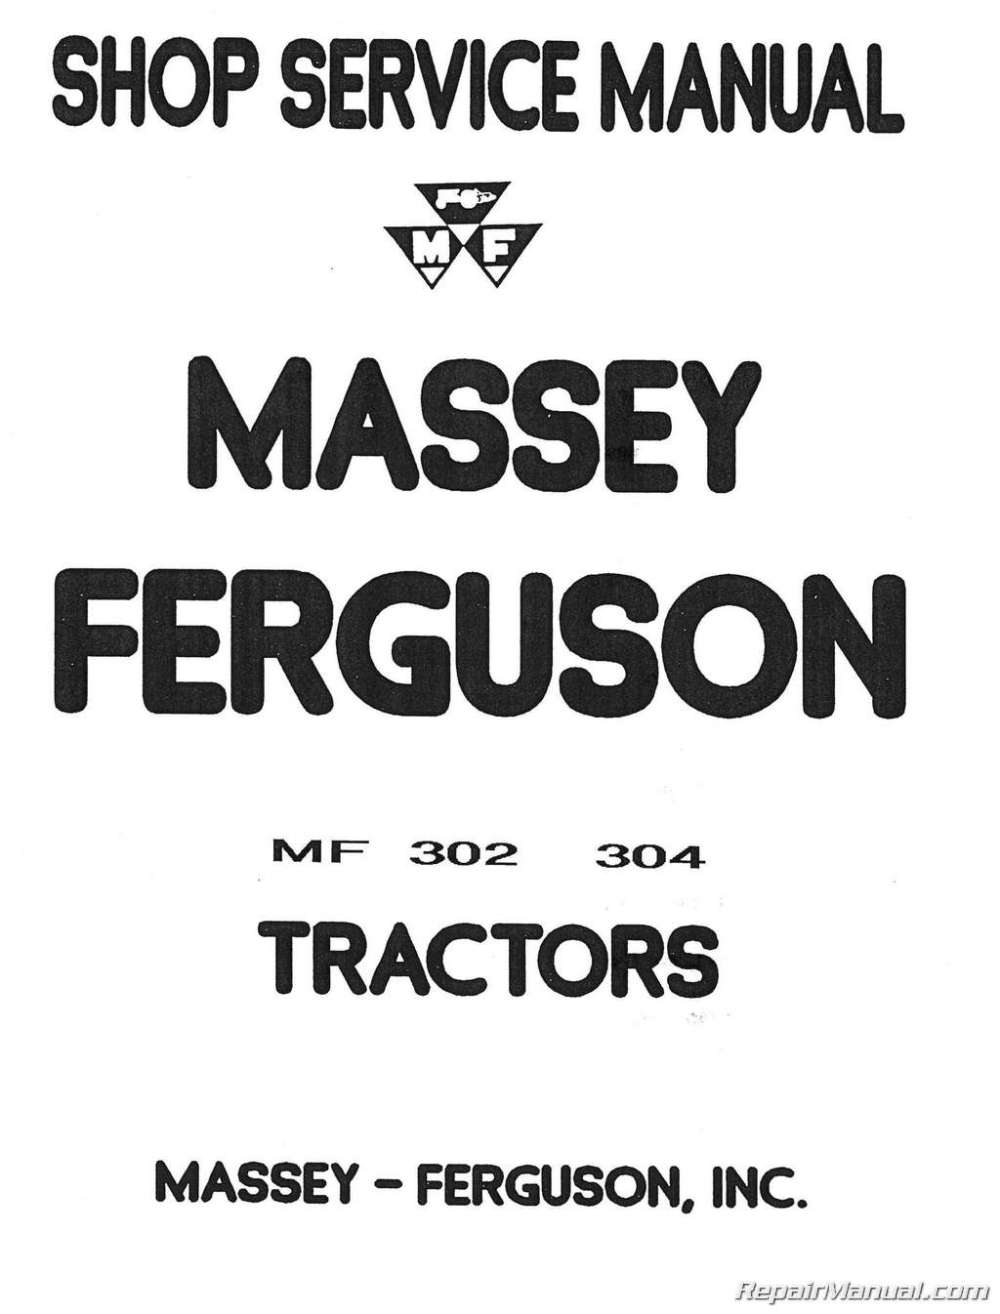 medium resolution of massey ferguson mf 302 mf 304 tractor mf 320 backhoe service manual rh repairmanual com massey